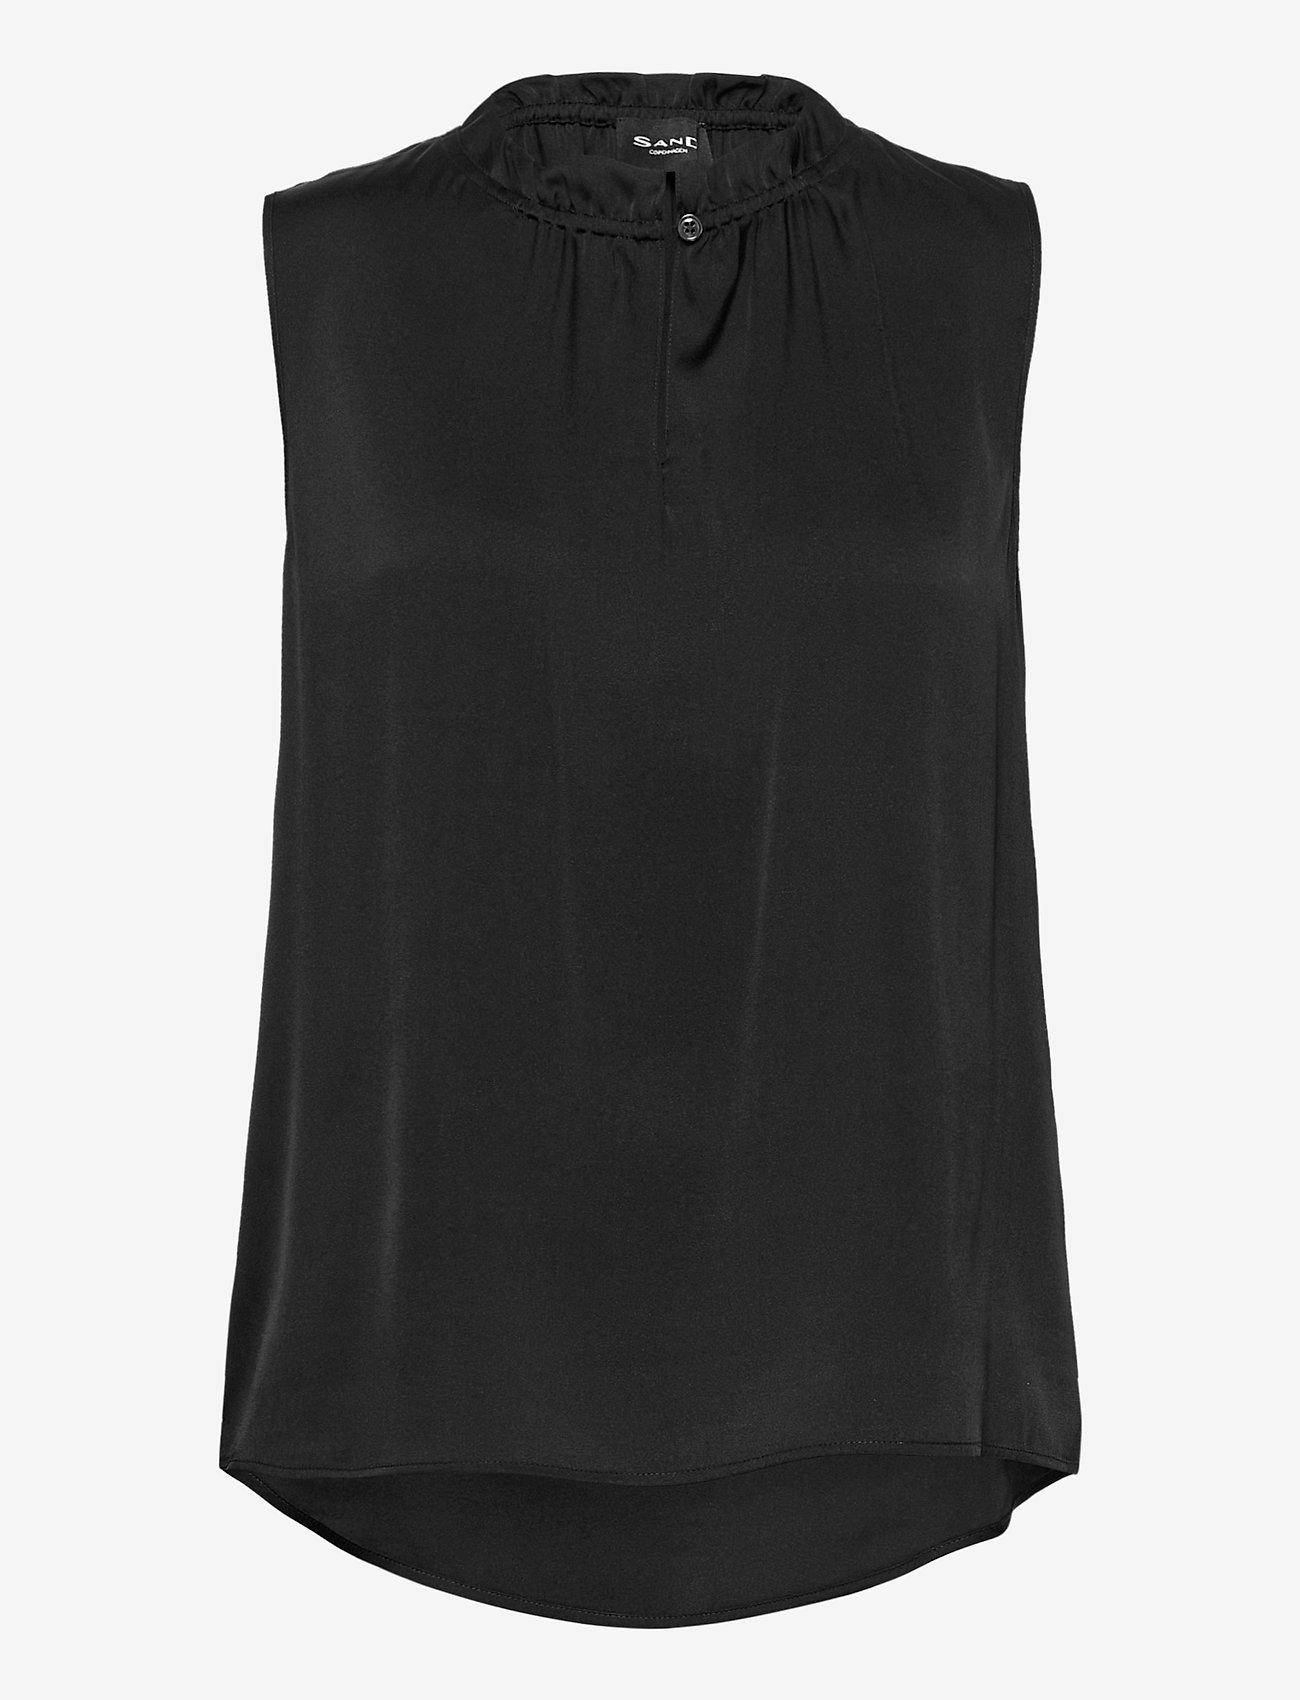 SAND - Satin Stretch - Raya F - blouses sans manches - black - 0